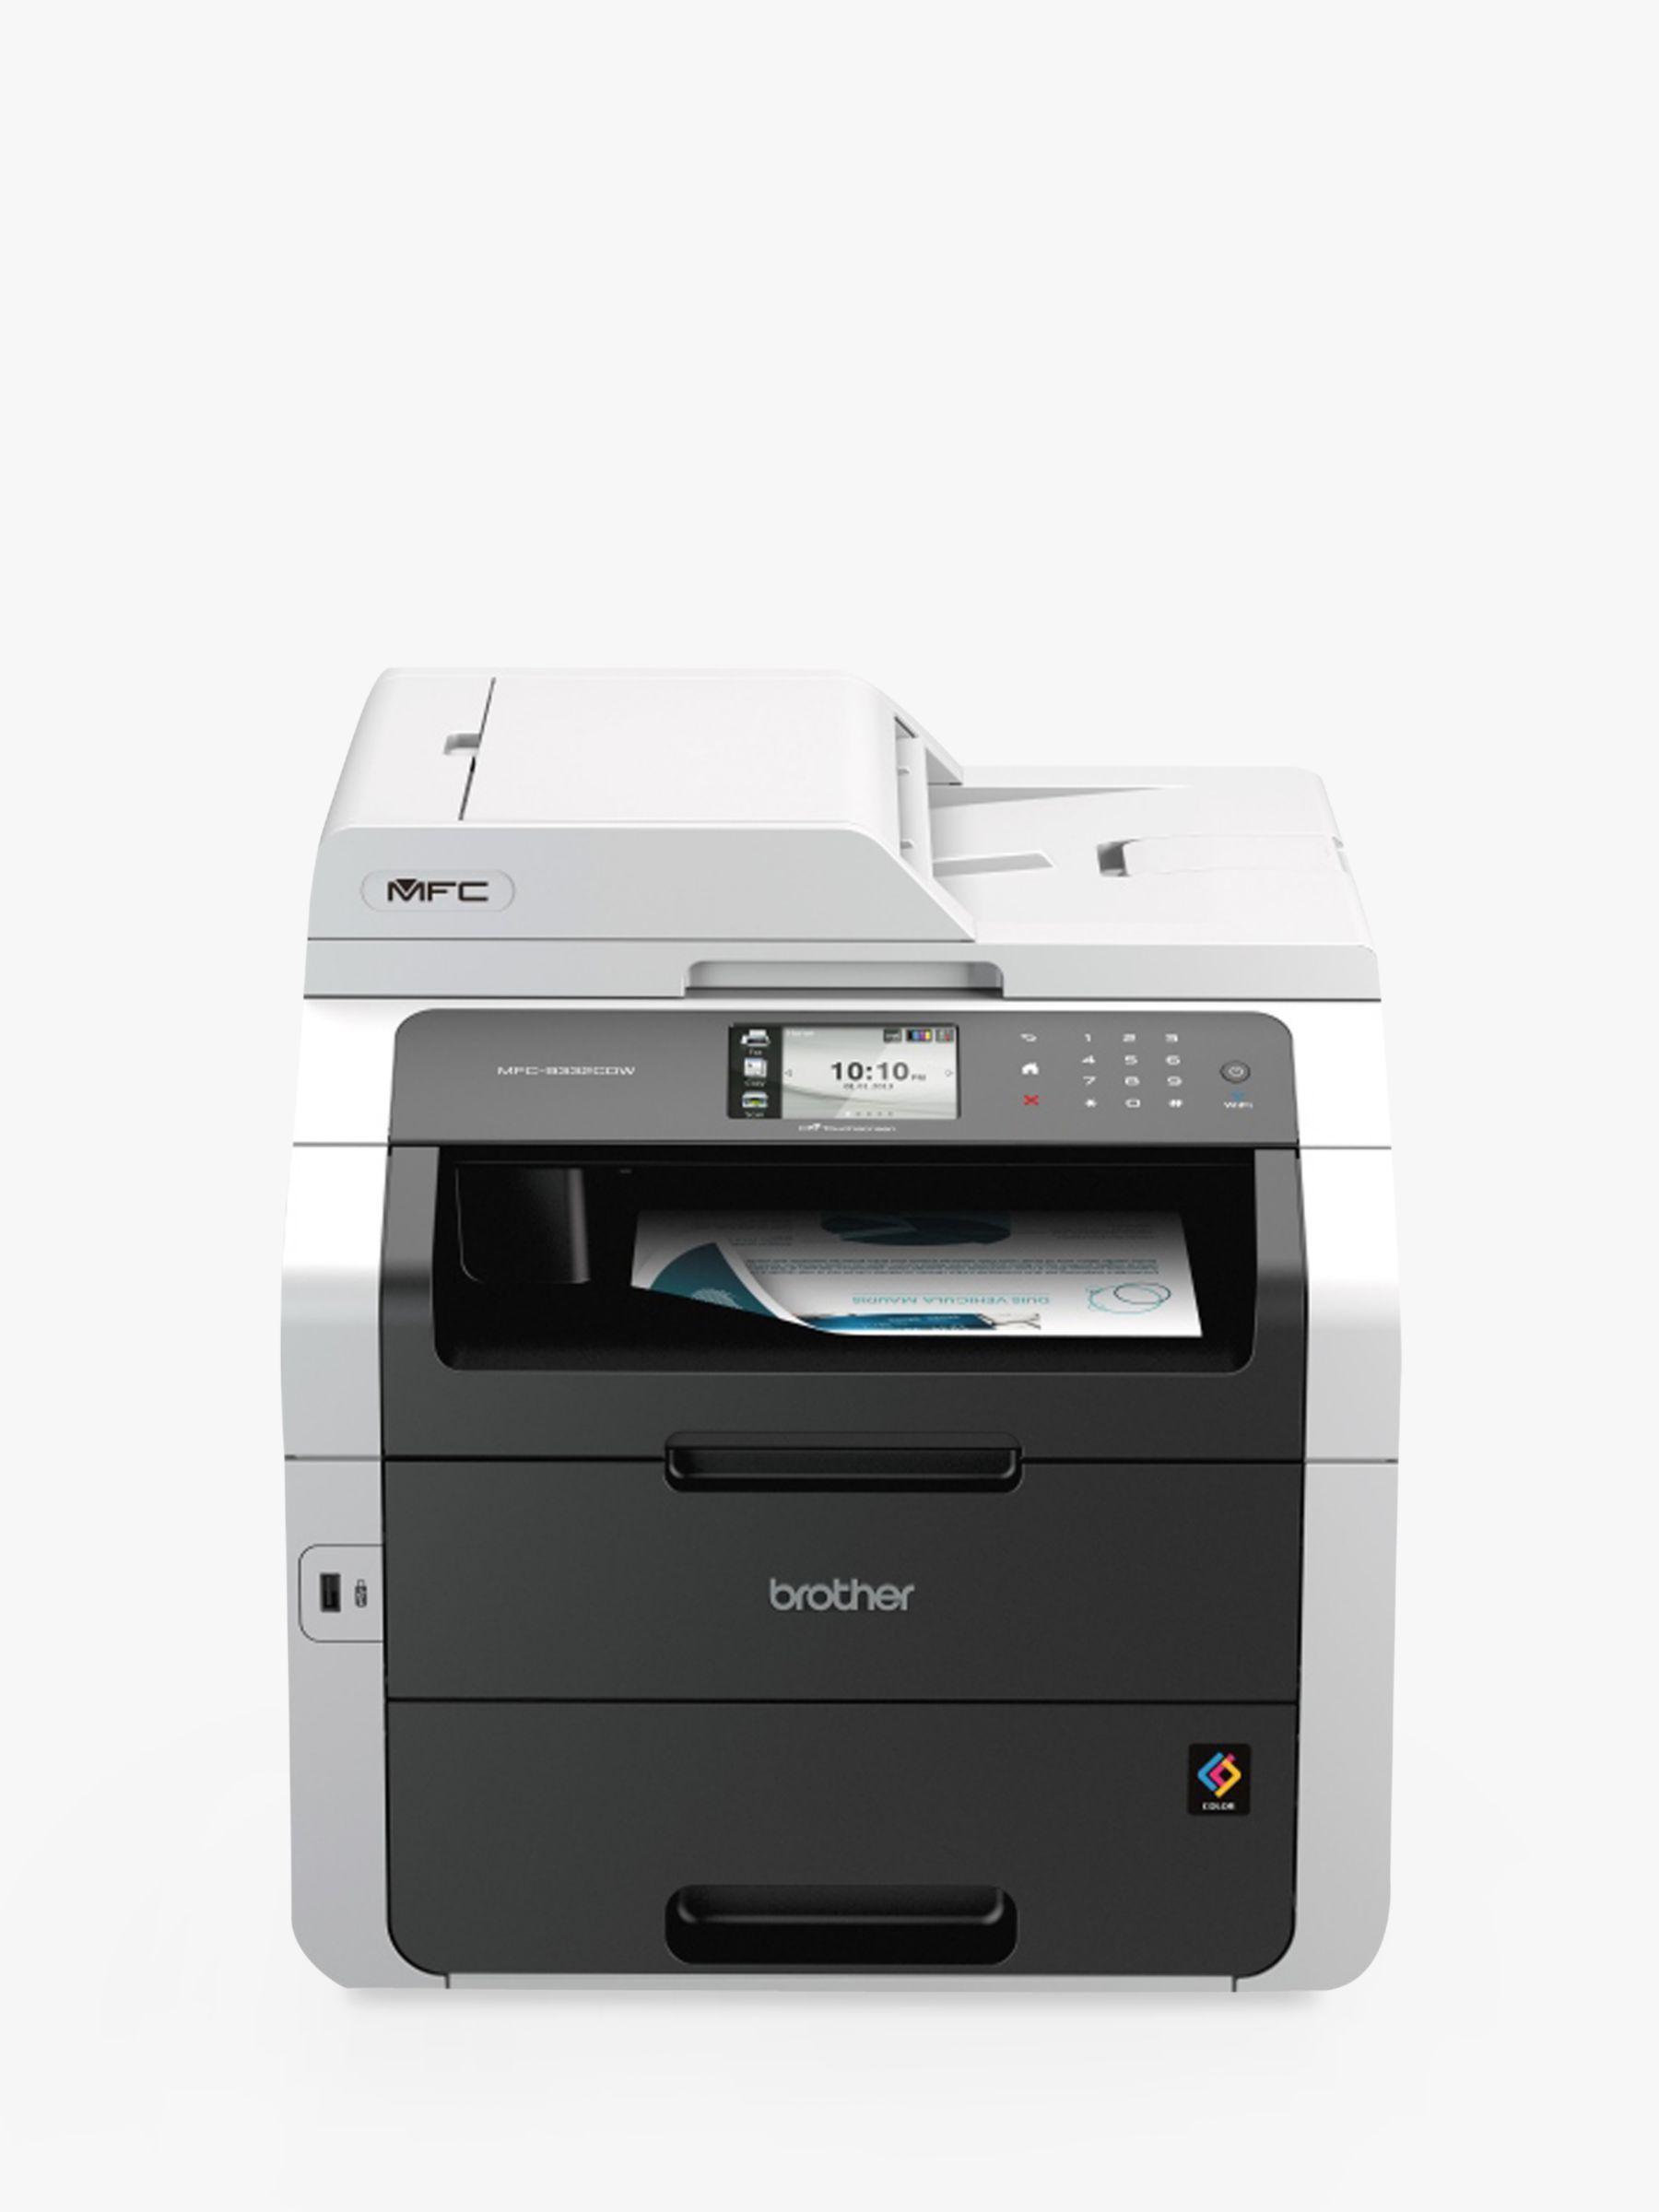 Brother MFC9330CDW Colour Laser AllinOne Printer with Duplex Fax